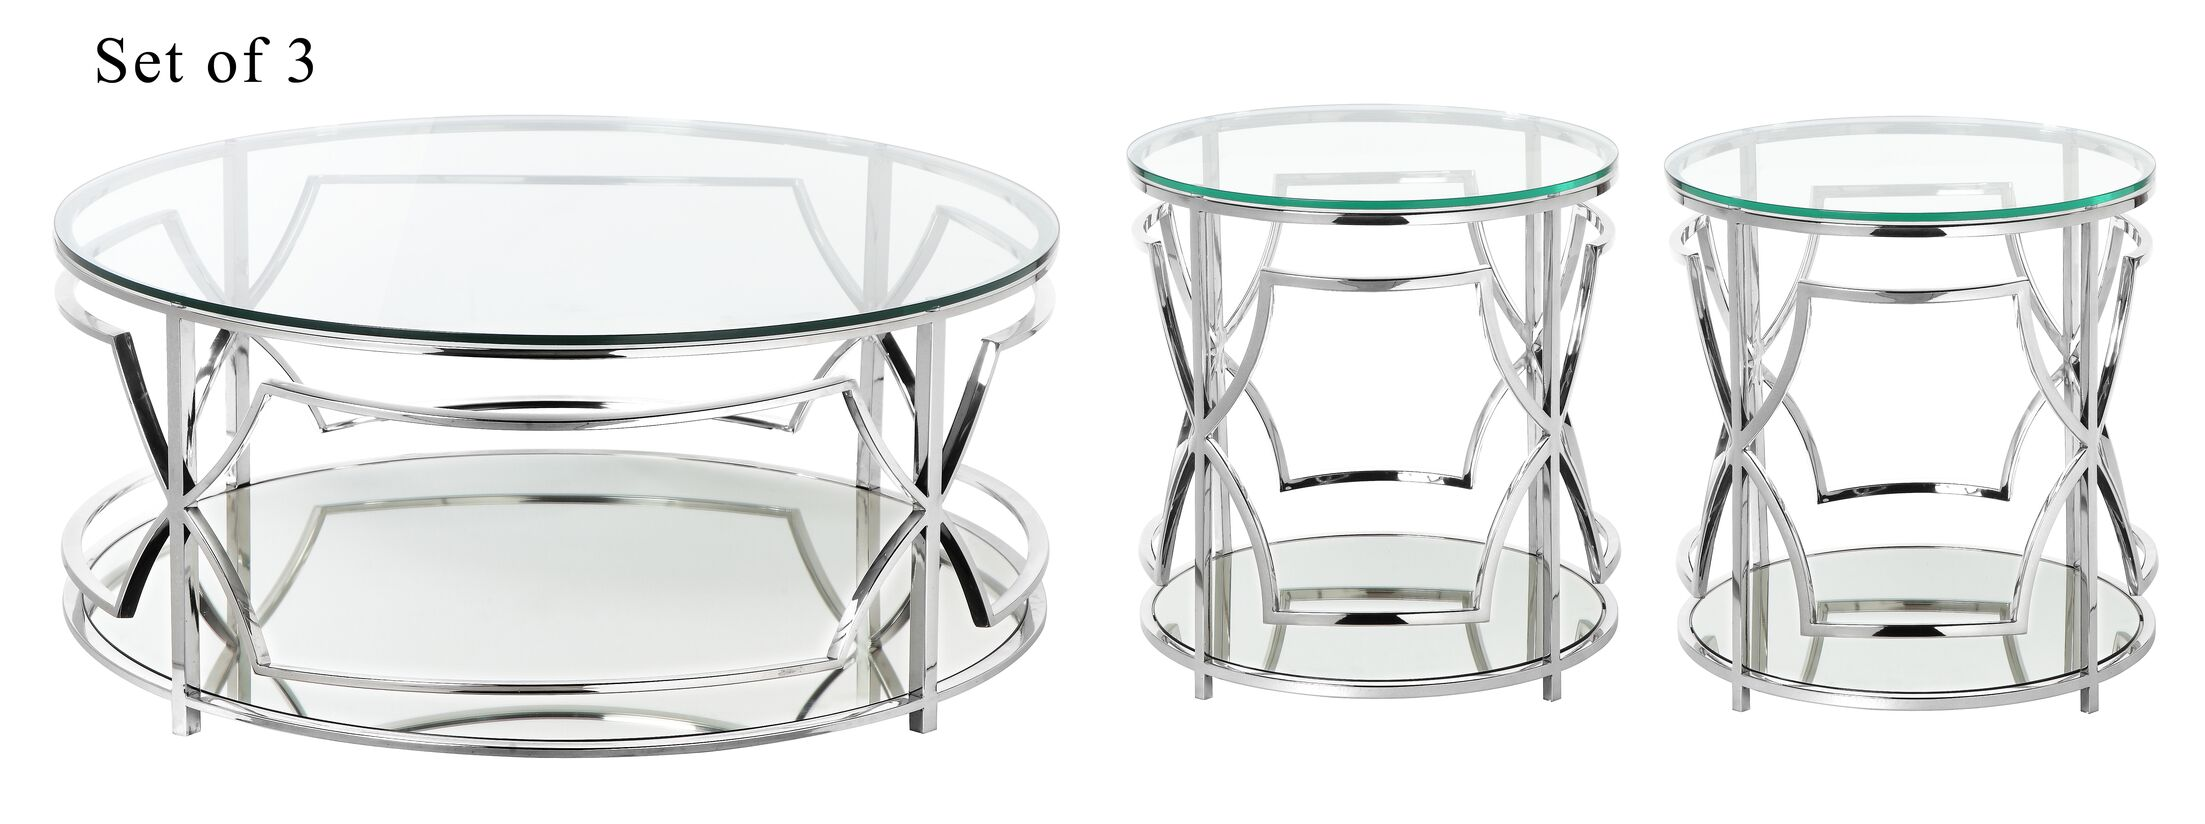 George Living Room 3 Piece Coffee Table Set Color: High Polish Steel